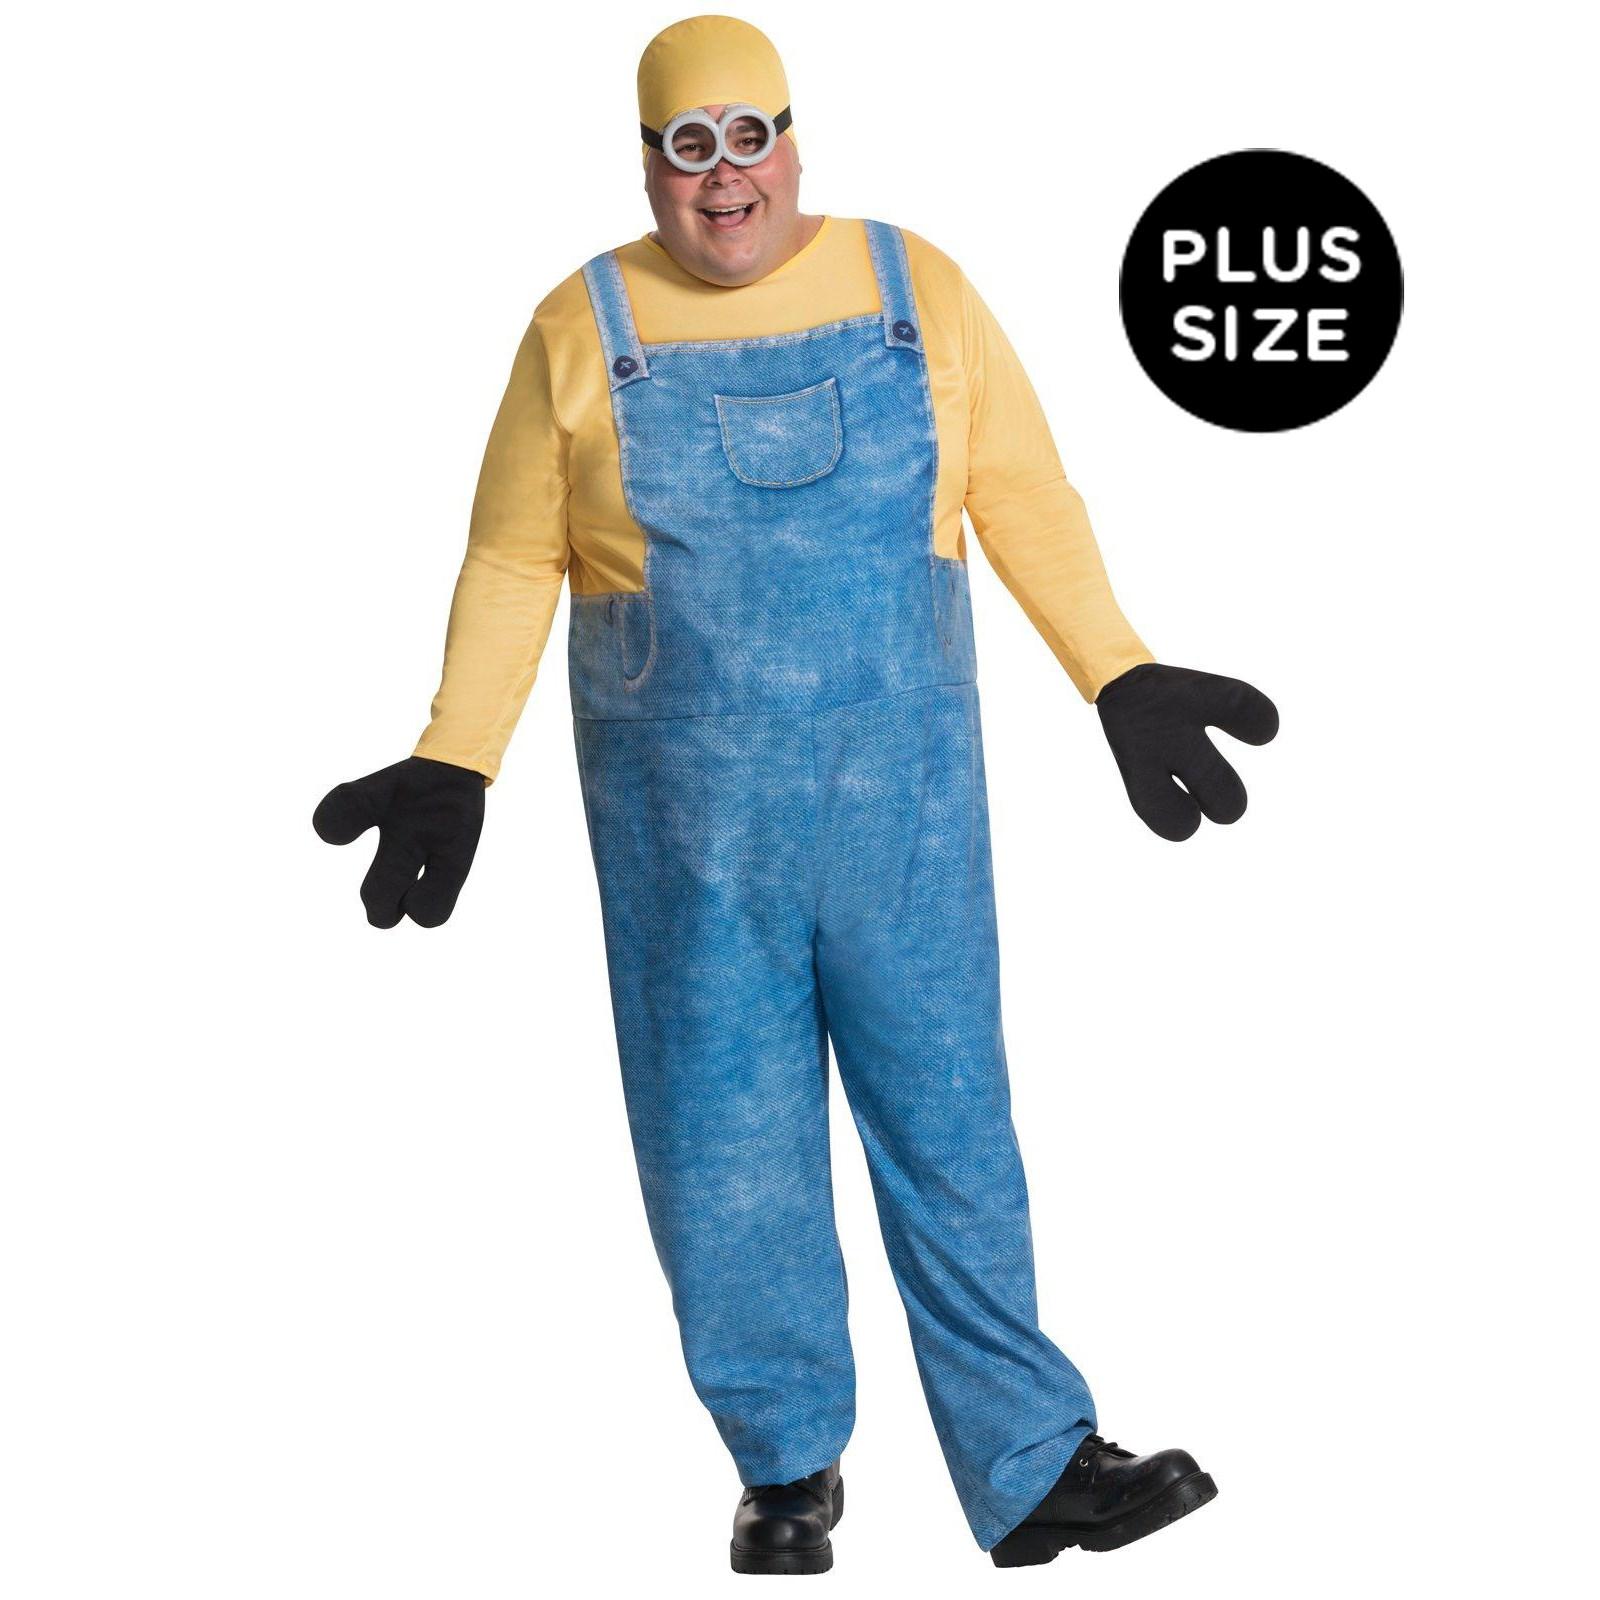 Minions Movie: Minion Bob Plus Size Costume For Adults